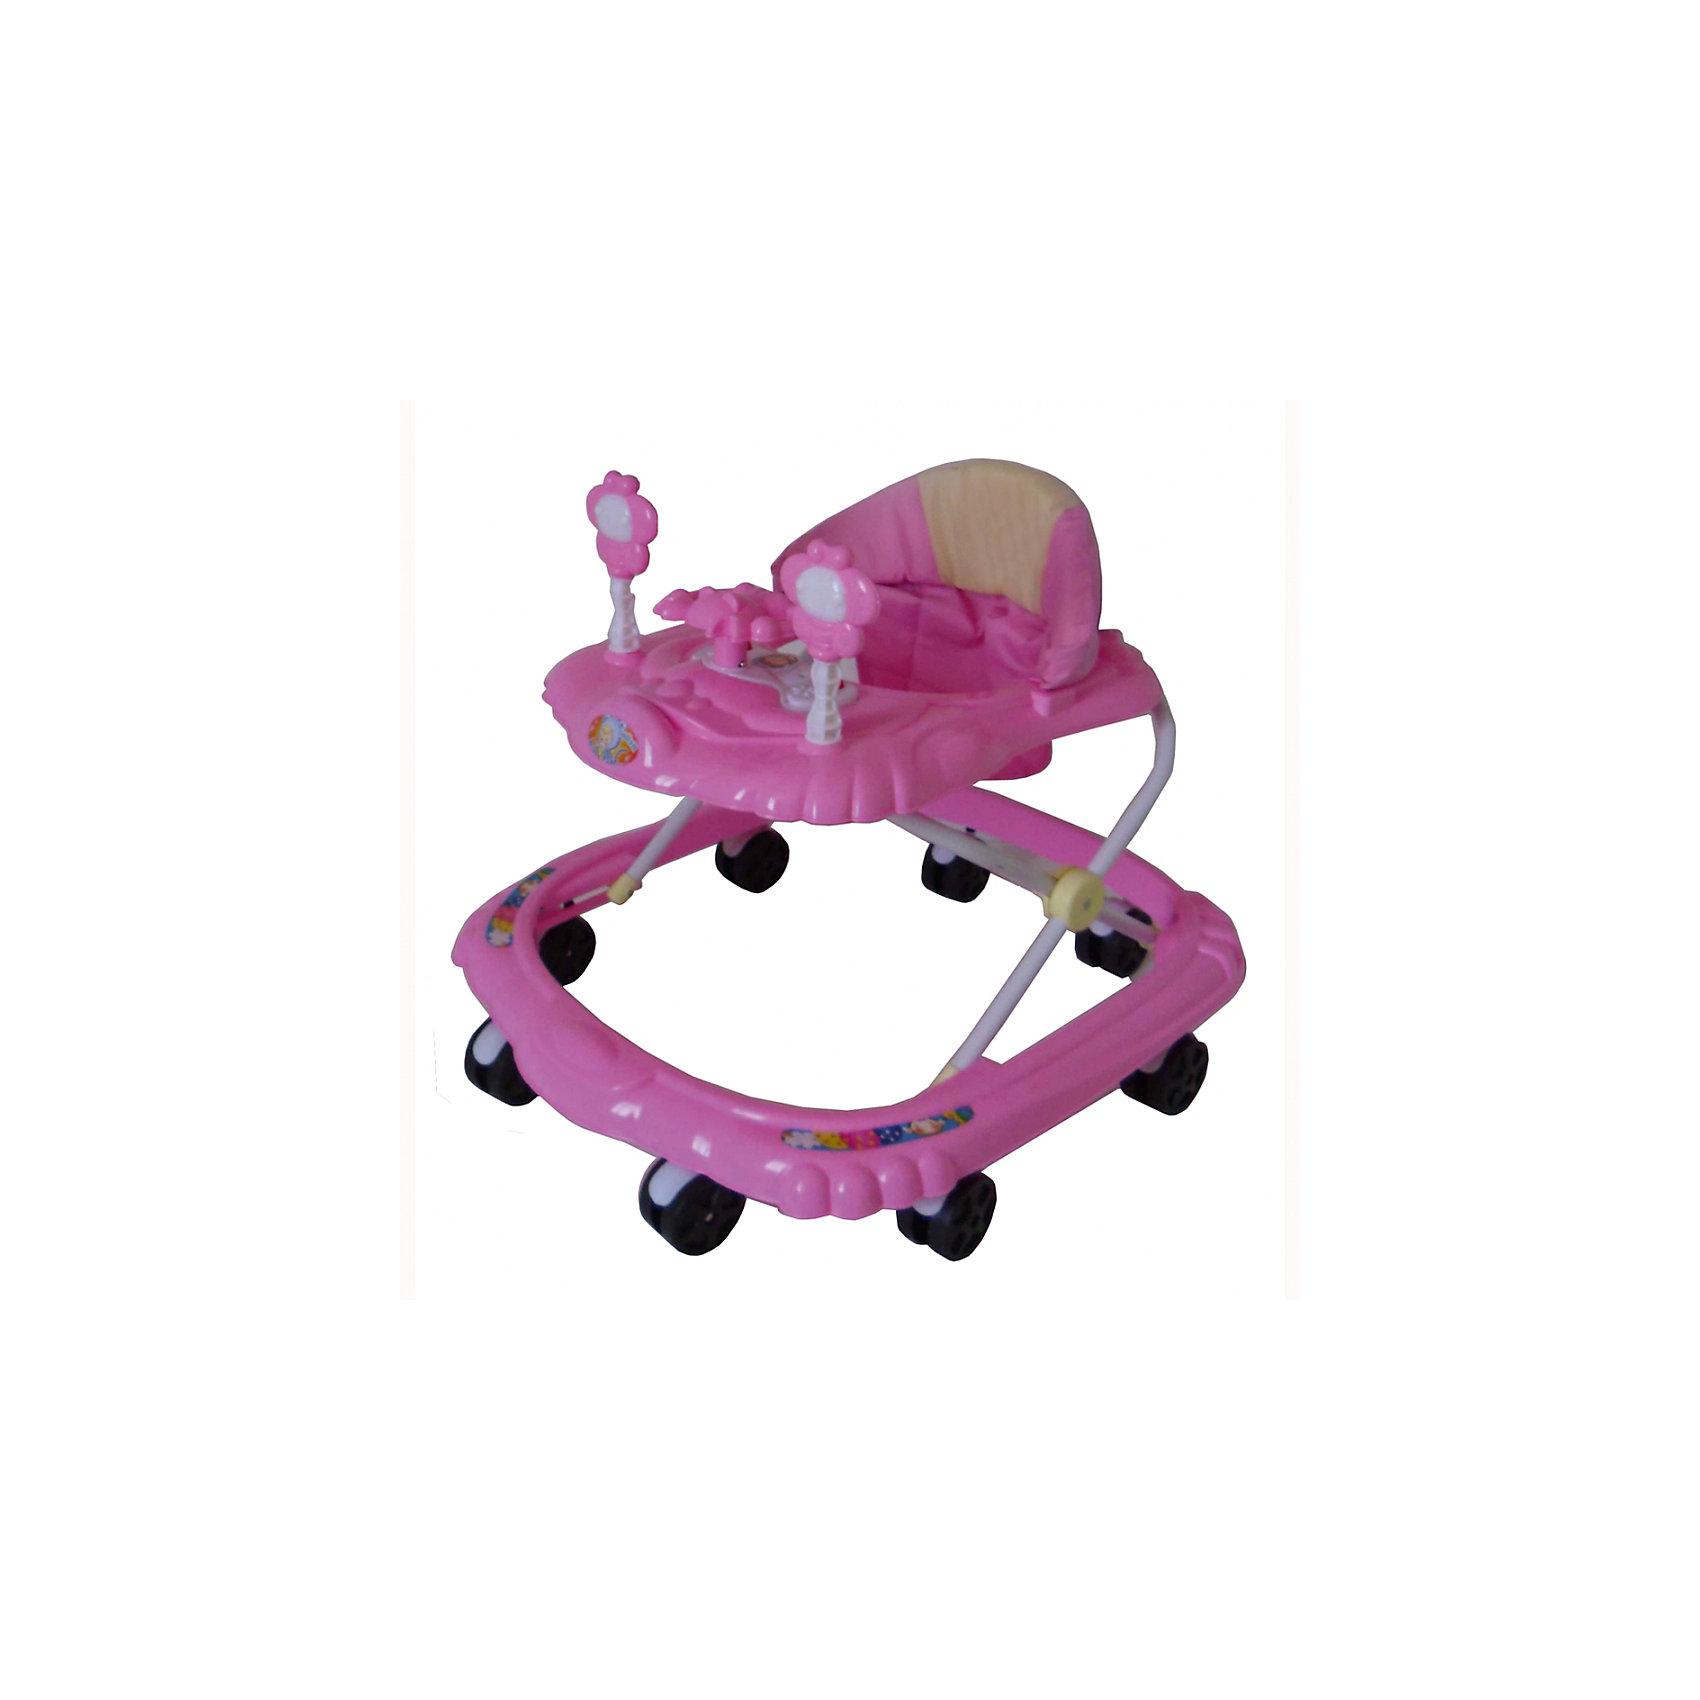 Ходунки Цветочки, Shine Ring, розовыйХодунки<br>SHINE RING  Ходунки (8 колес,игрушки,муз) 6 шт в кор.(66*56*47), PINK/ Розовый<br><br>Ширина мм: 670<br>Глубина мм: 600<br>Высота мм: 520<br>Вес г: 2600<br>Возраст от месяцев: 6<br>Возраст до месяцев: 12<br>Пол: Унисекс<br>Возраст: Детский<br>SKU: 5559224